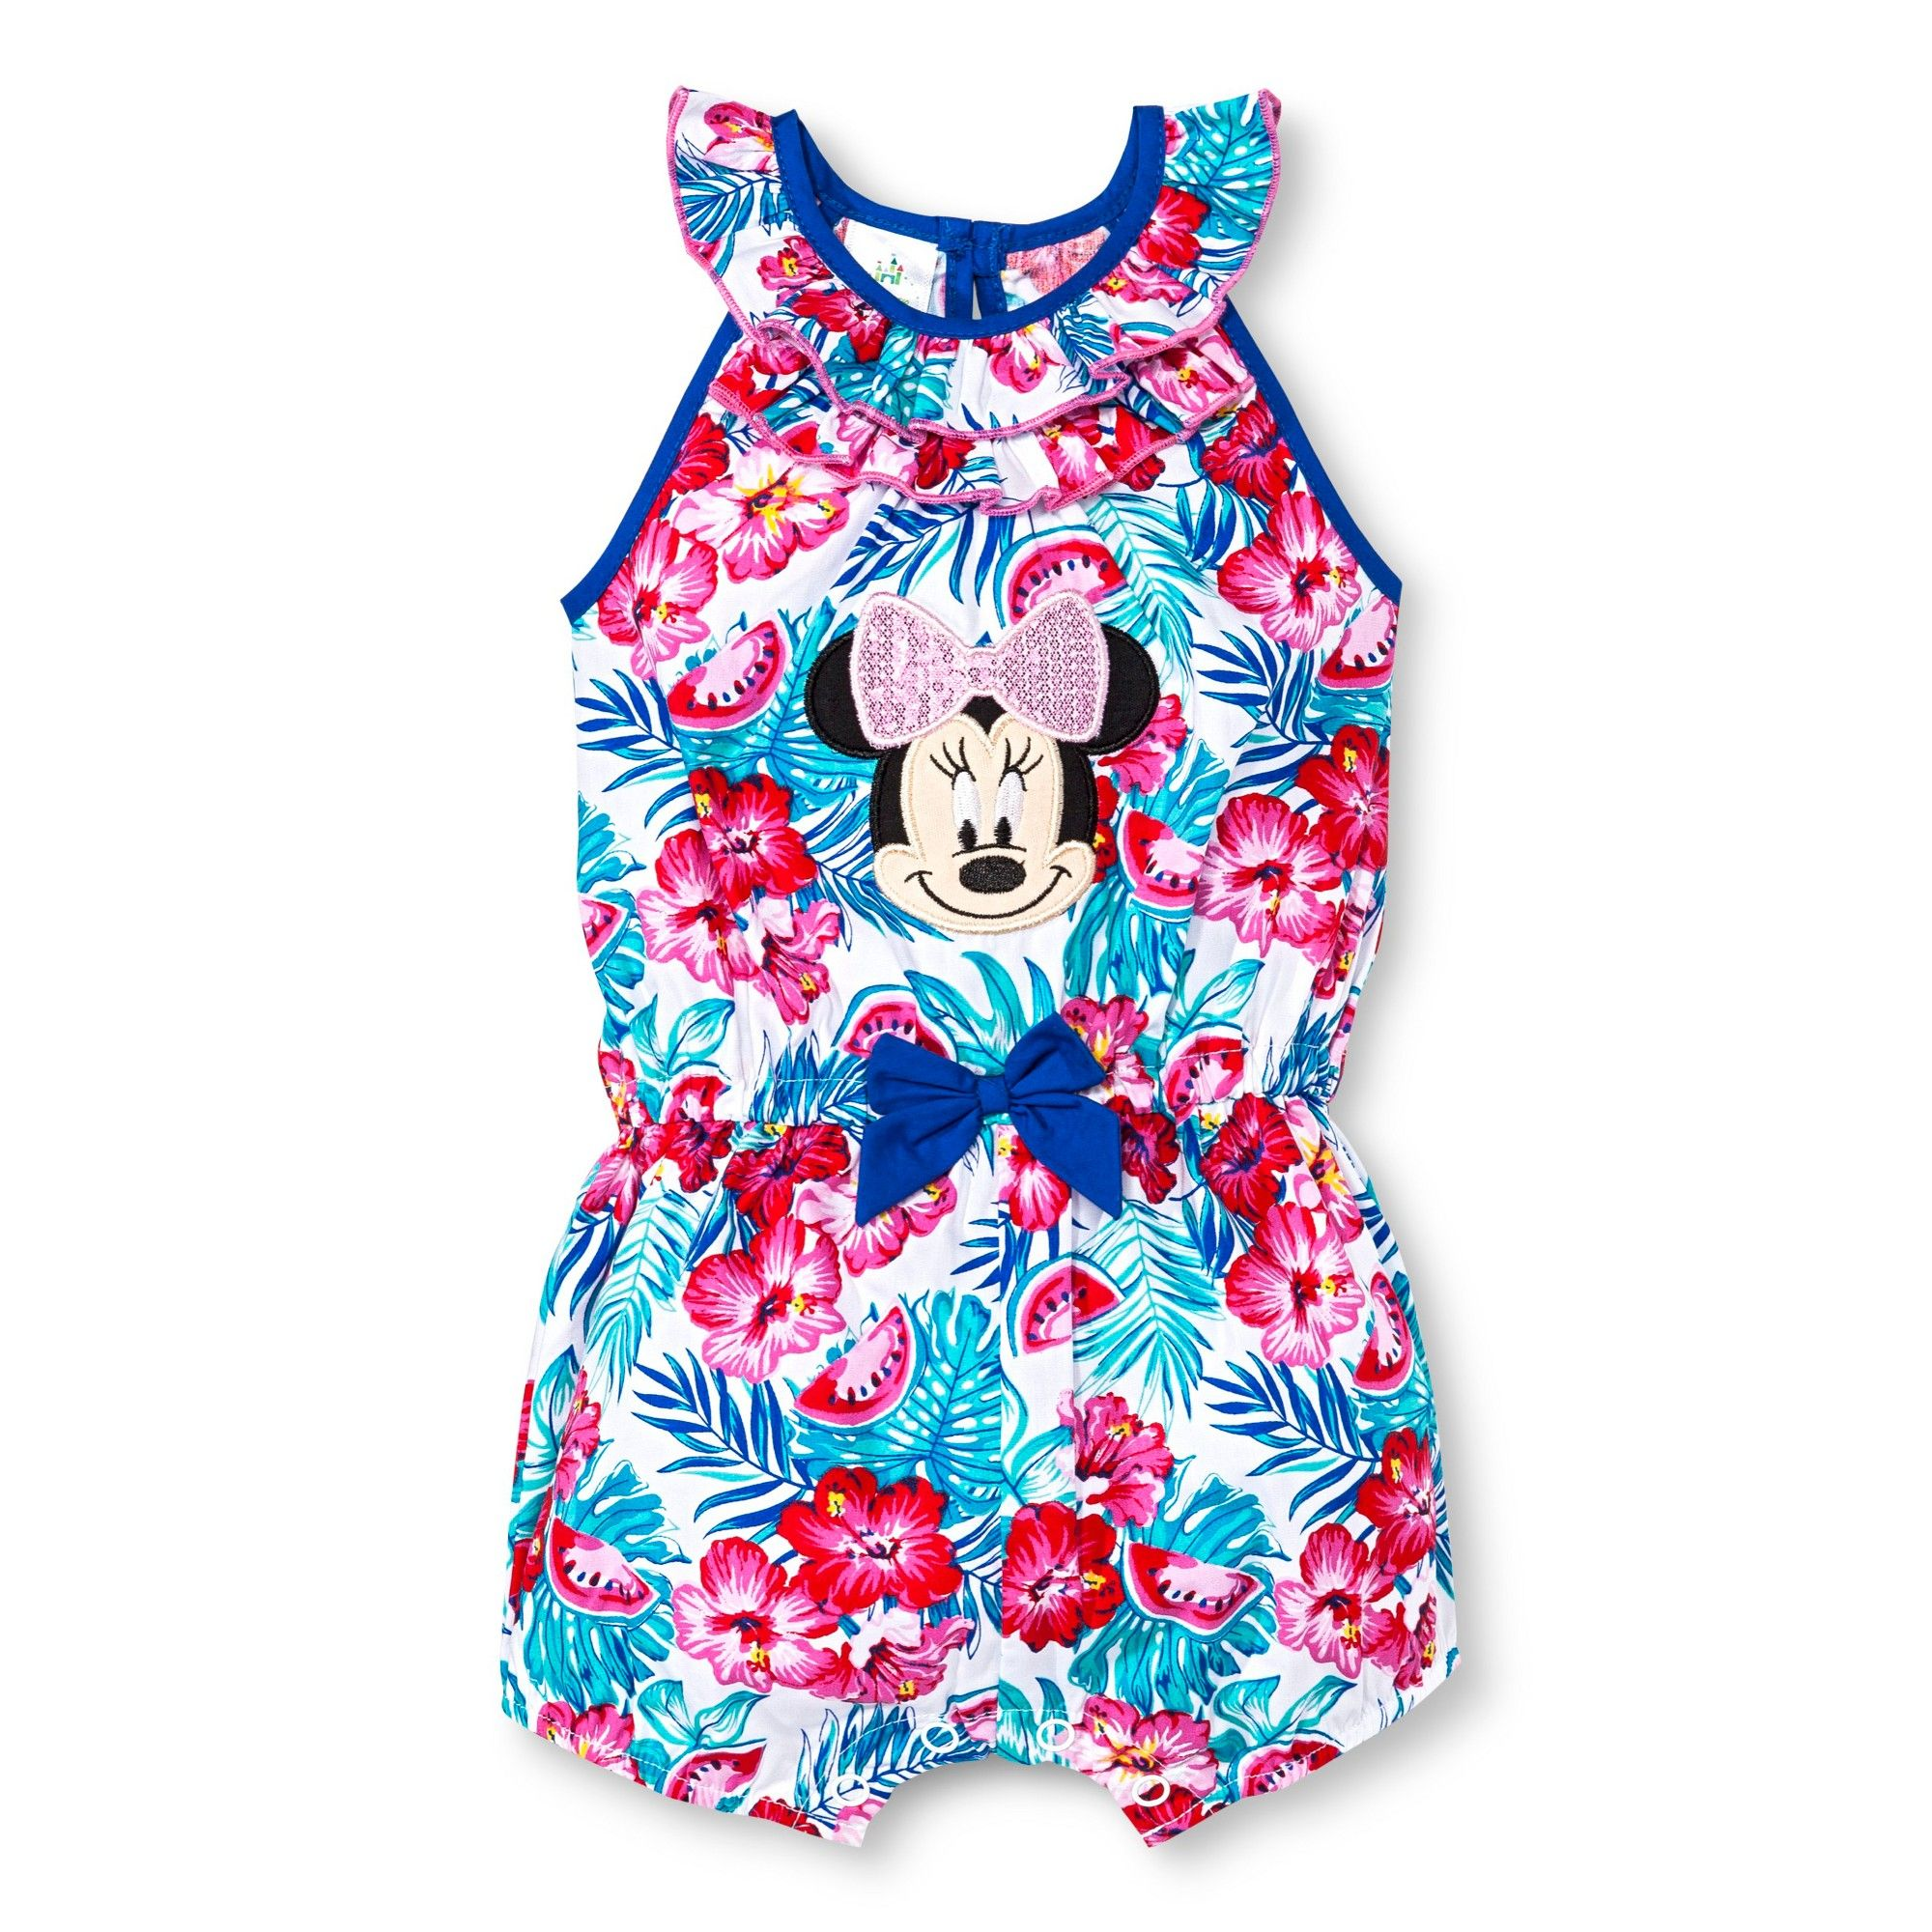 d6e6d1430a43 Disney Minnie Mouse Baby Girls  Romper - White 12M